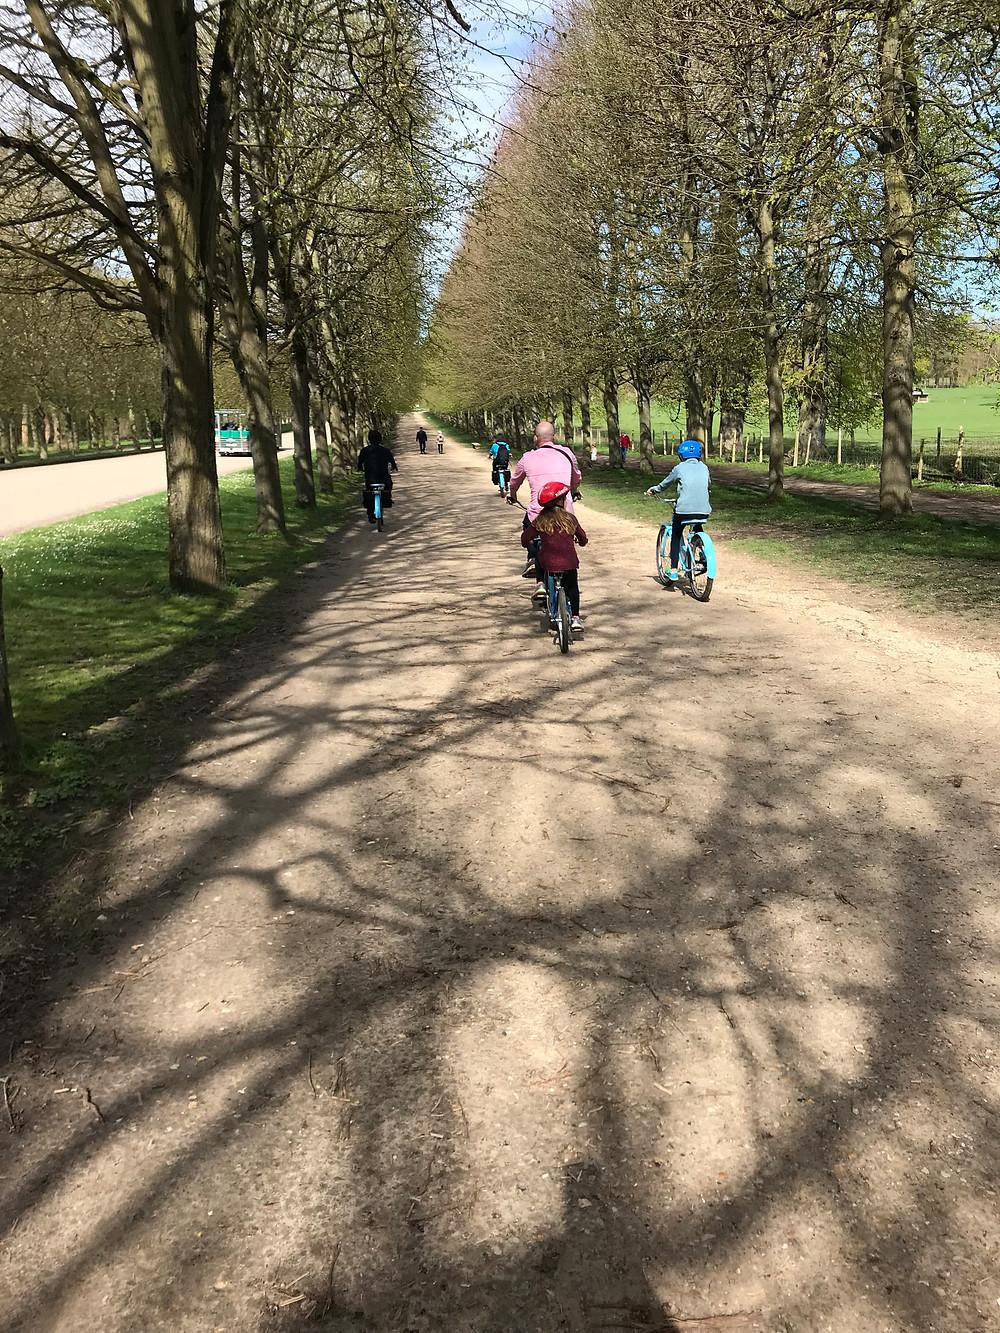 Biking the grounds of Versailles